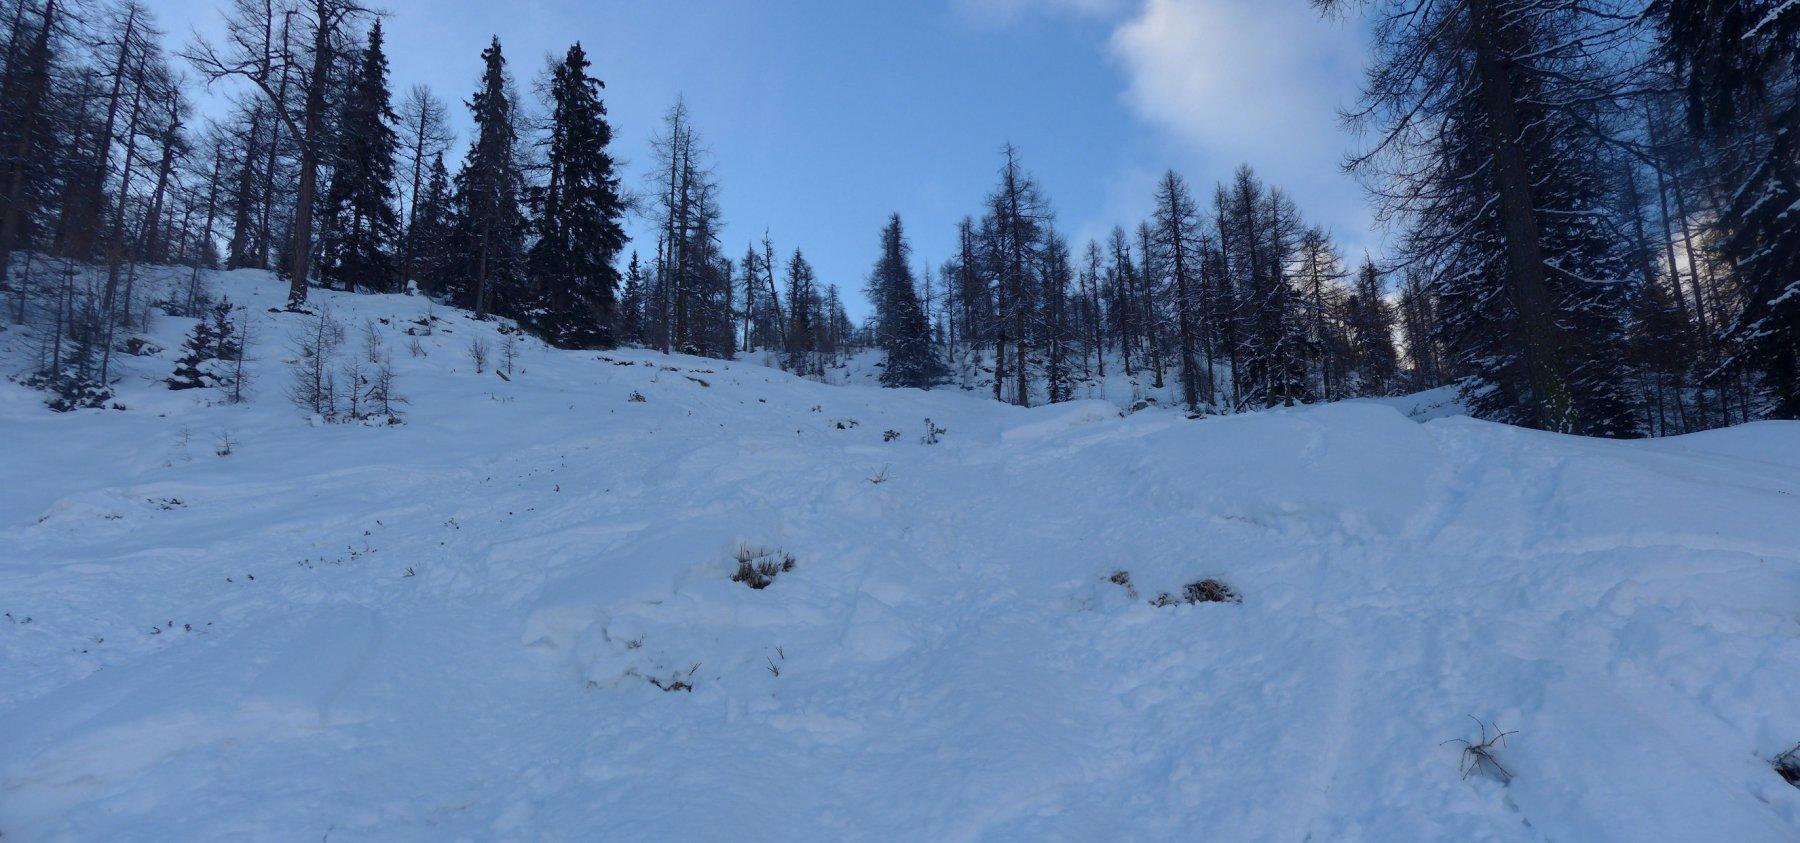 neve ce n'è, basta scansare gli arbusti...